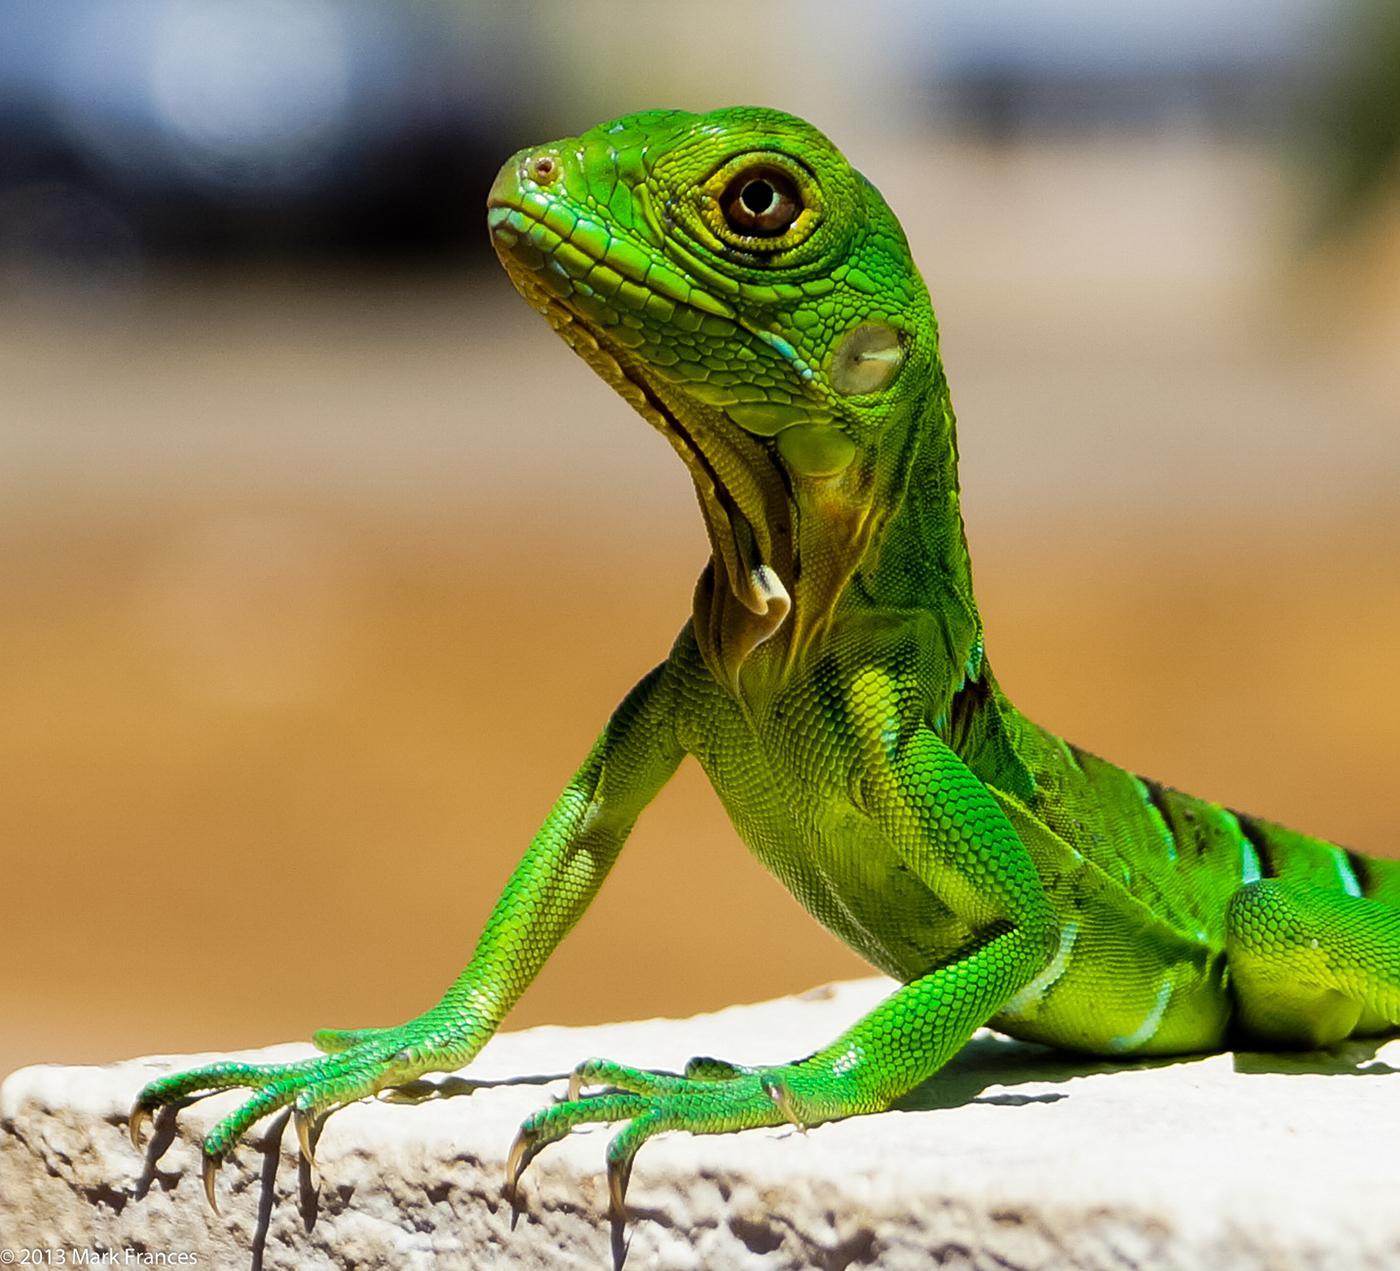 Baby Green Iguana - Aruba on Behance - photo#19